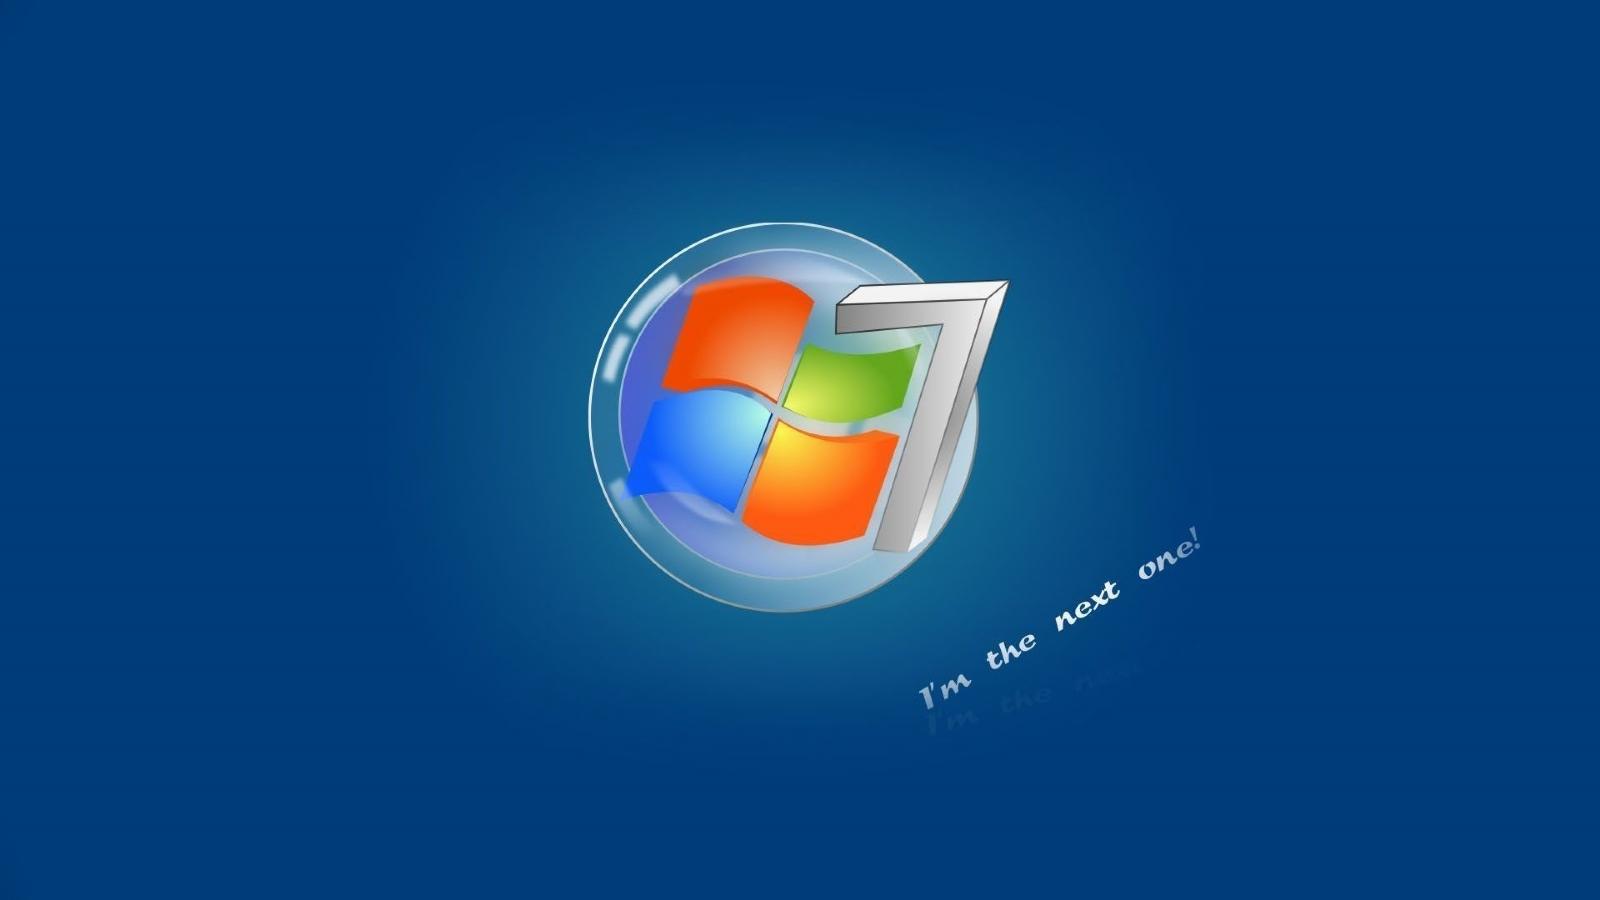 1600x900 Windows 7 Background Acer Wallpaper 1600 X 157kb On Pinterest 1600x900